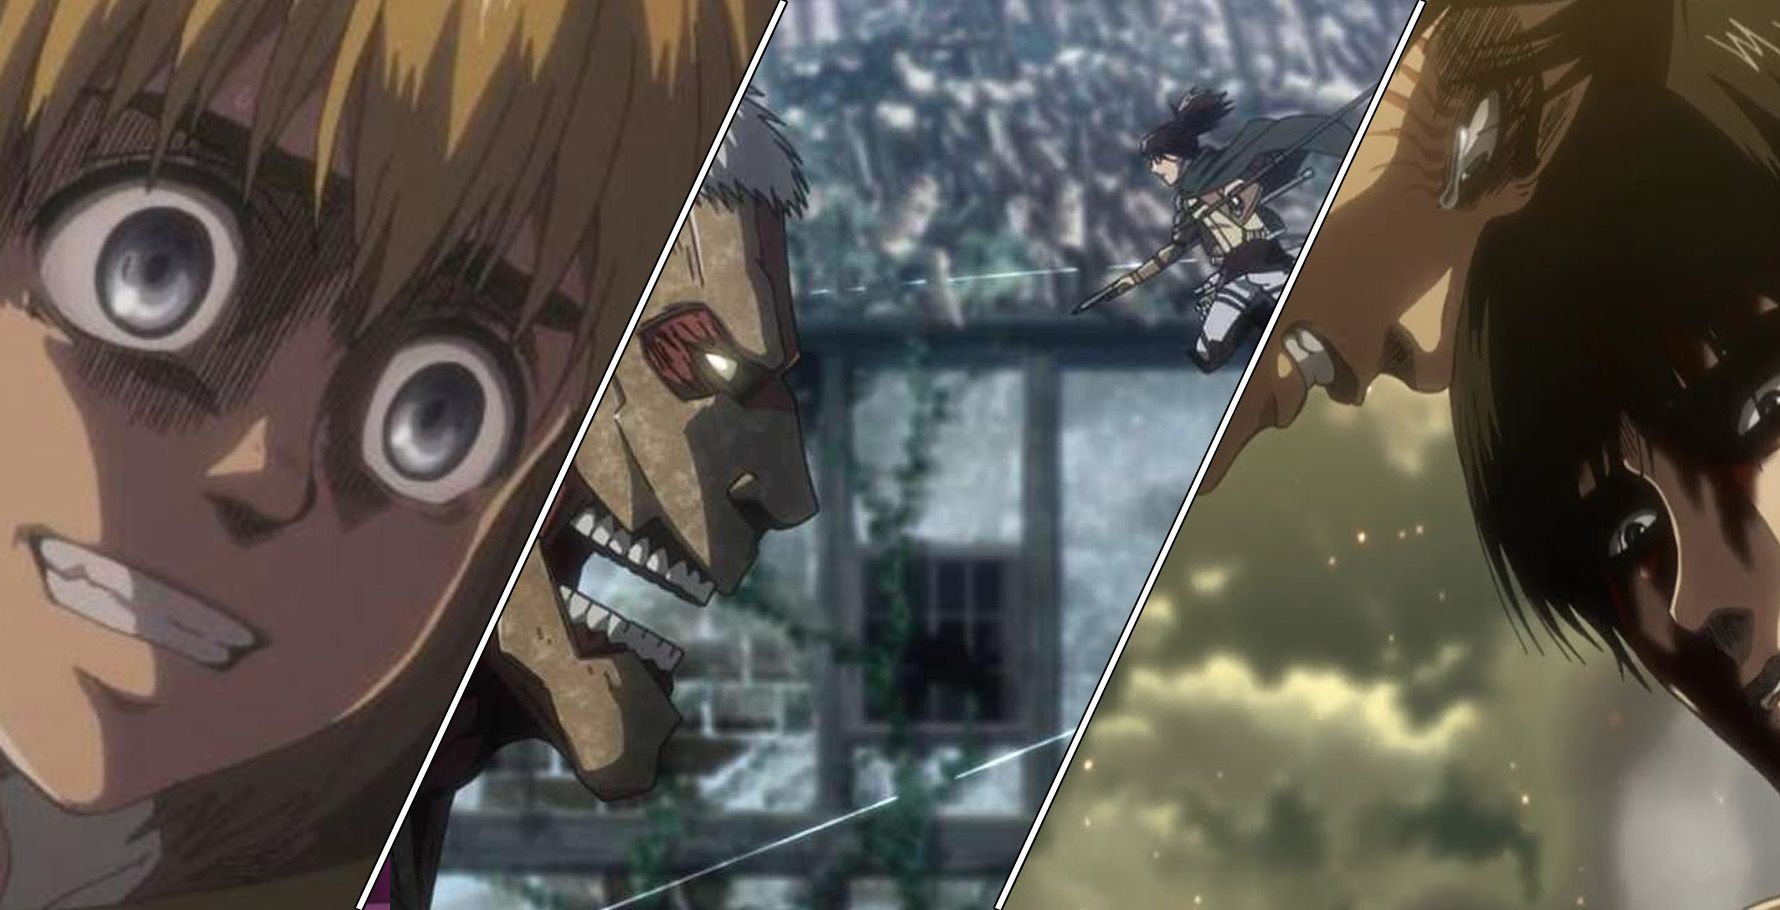 Attack On Titan: 10 Details People Missed In Season 3 | CBR